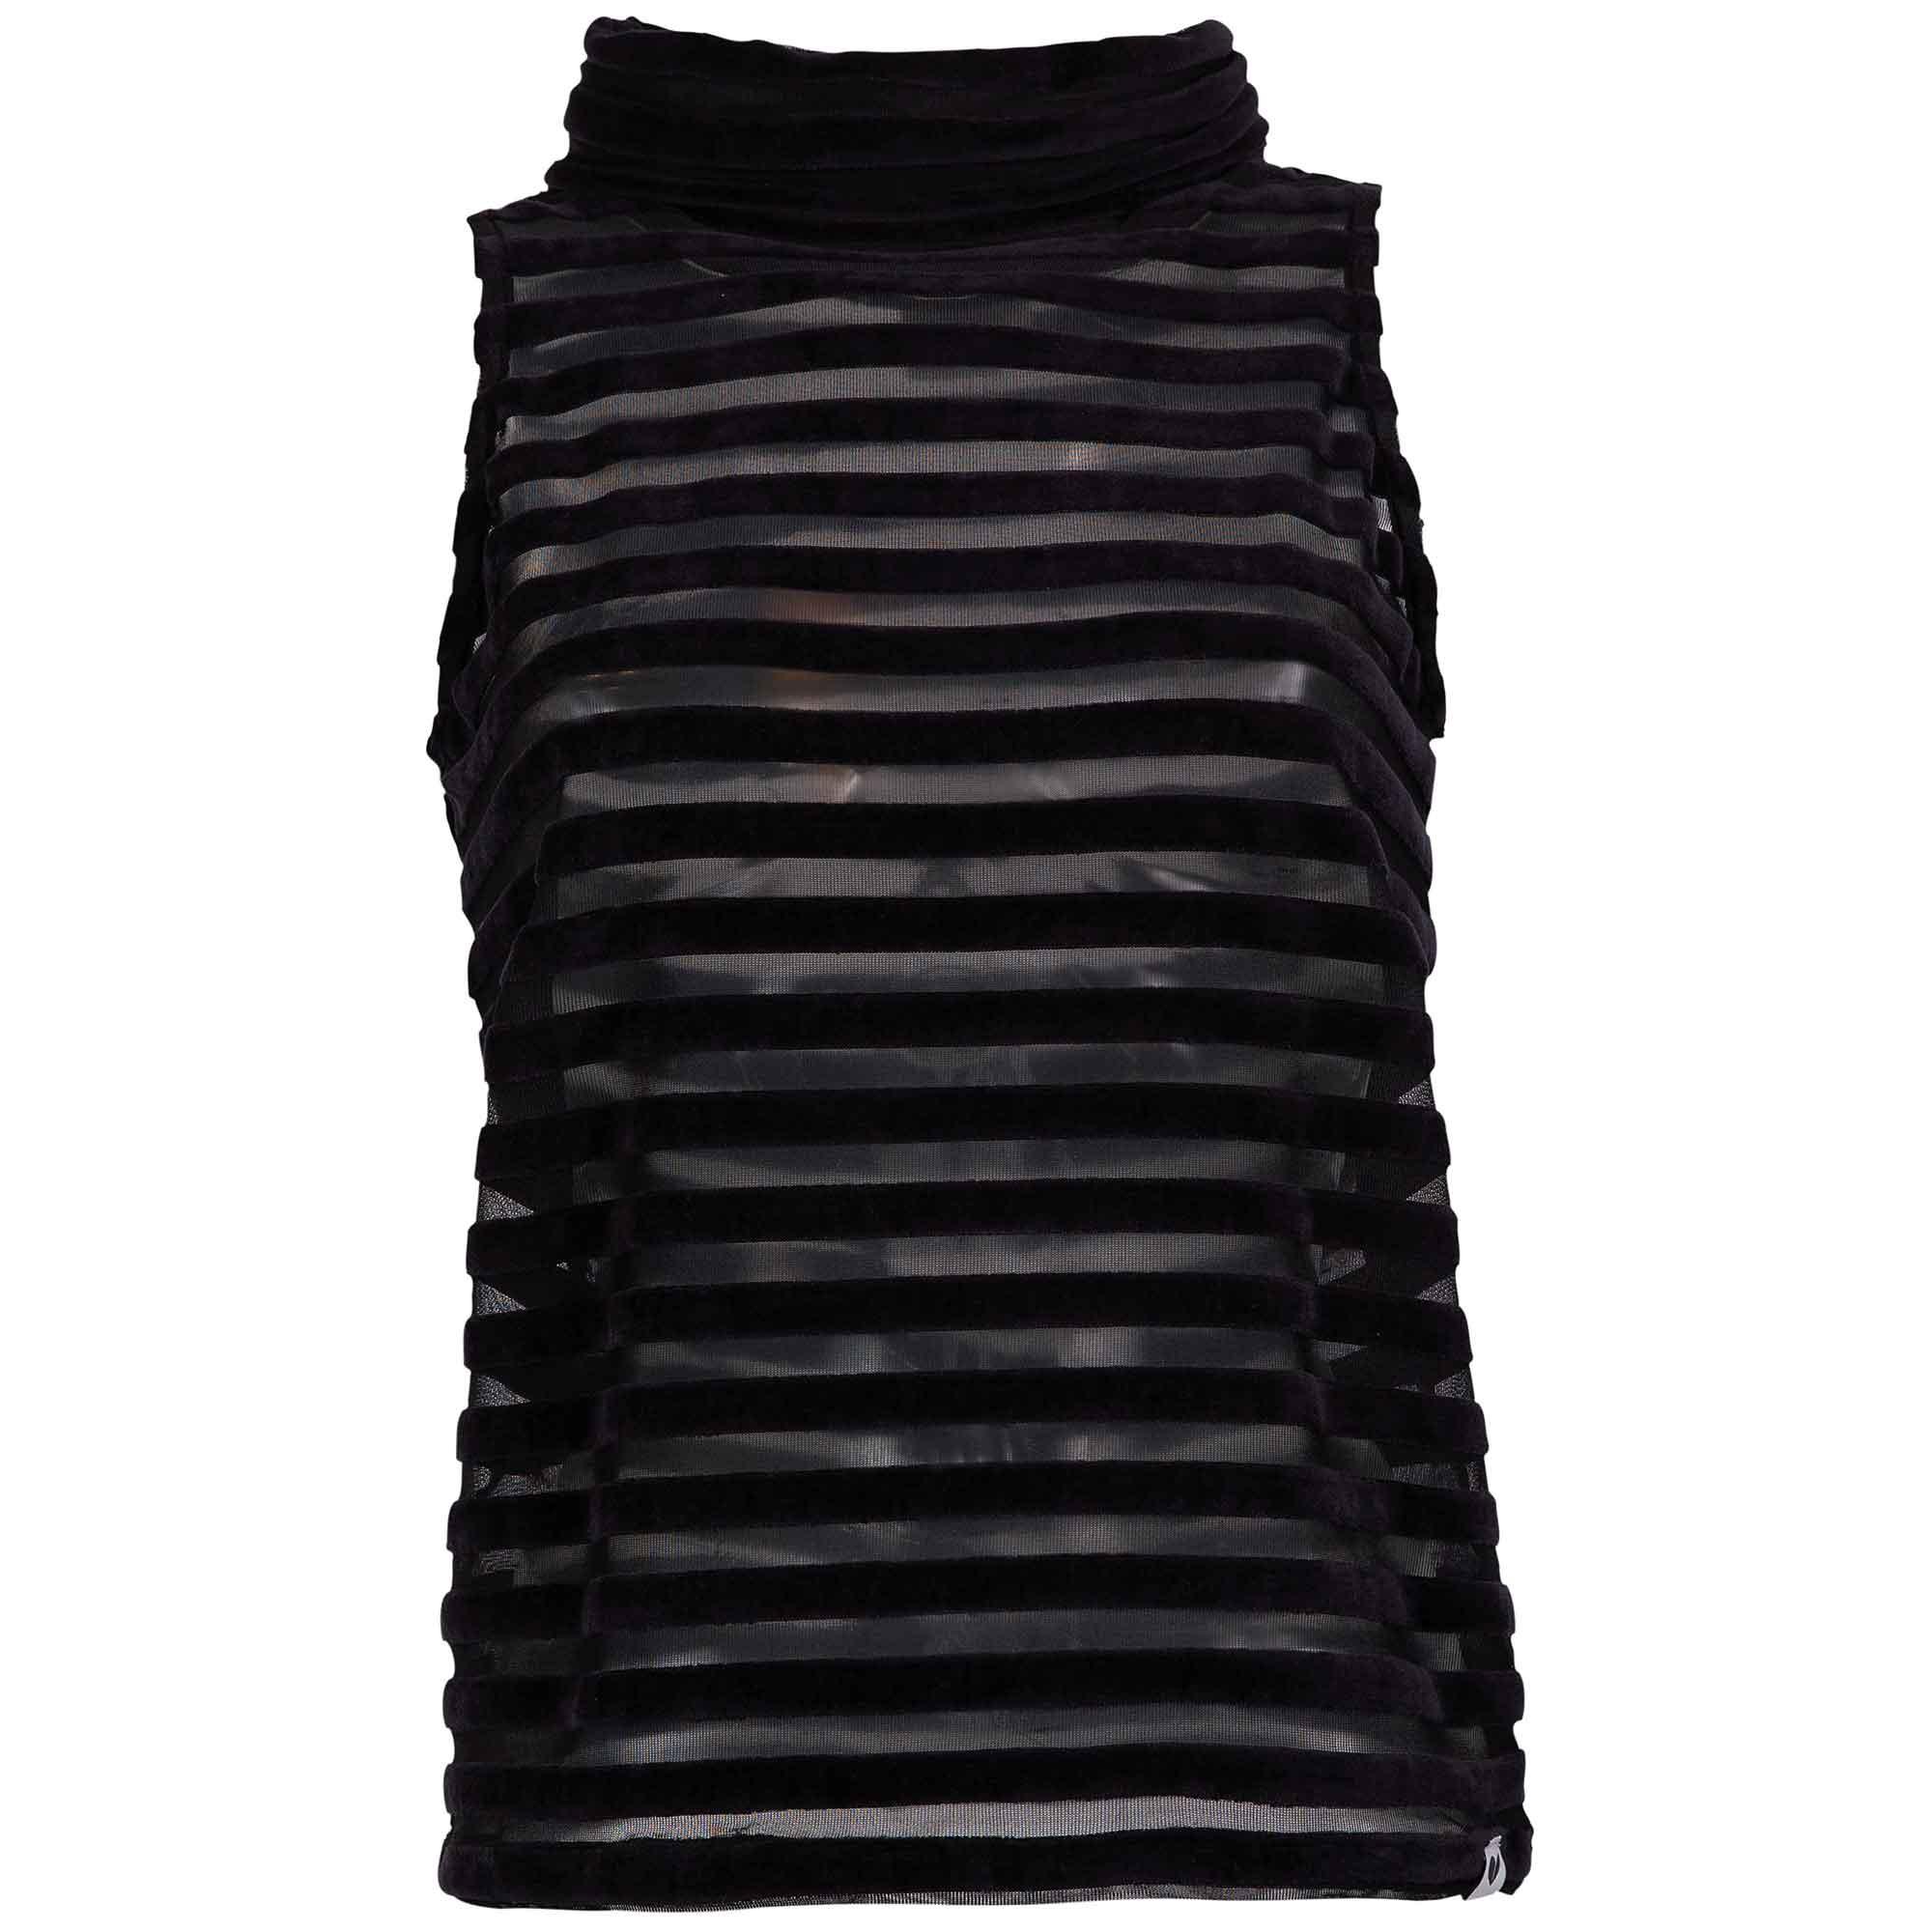 LOVJOI FEATHERFOIL Top Velvet Stripes Black Organic & Fair